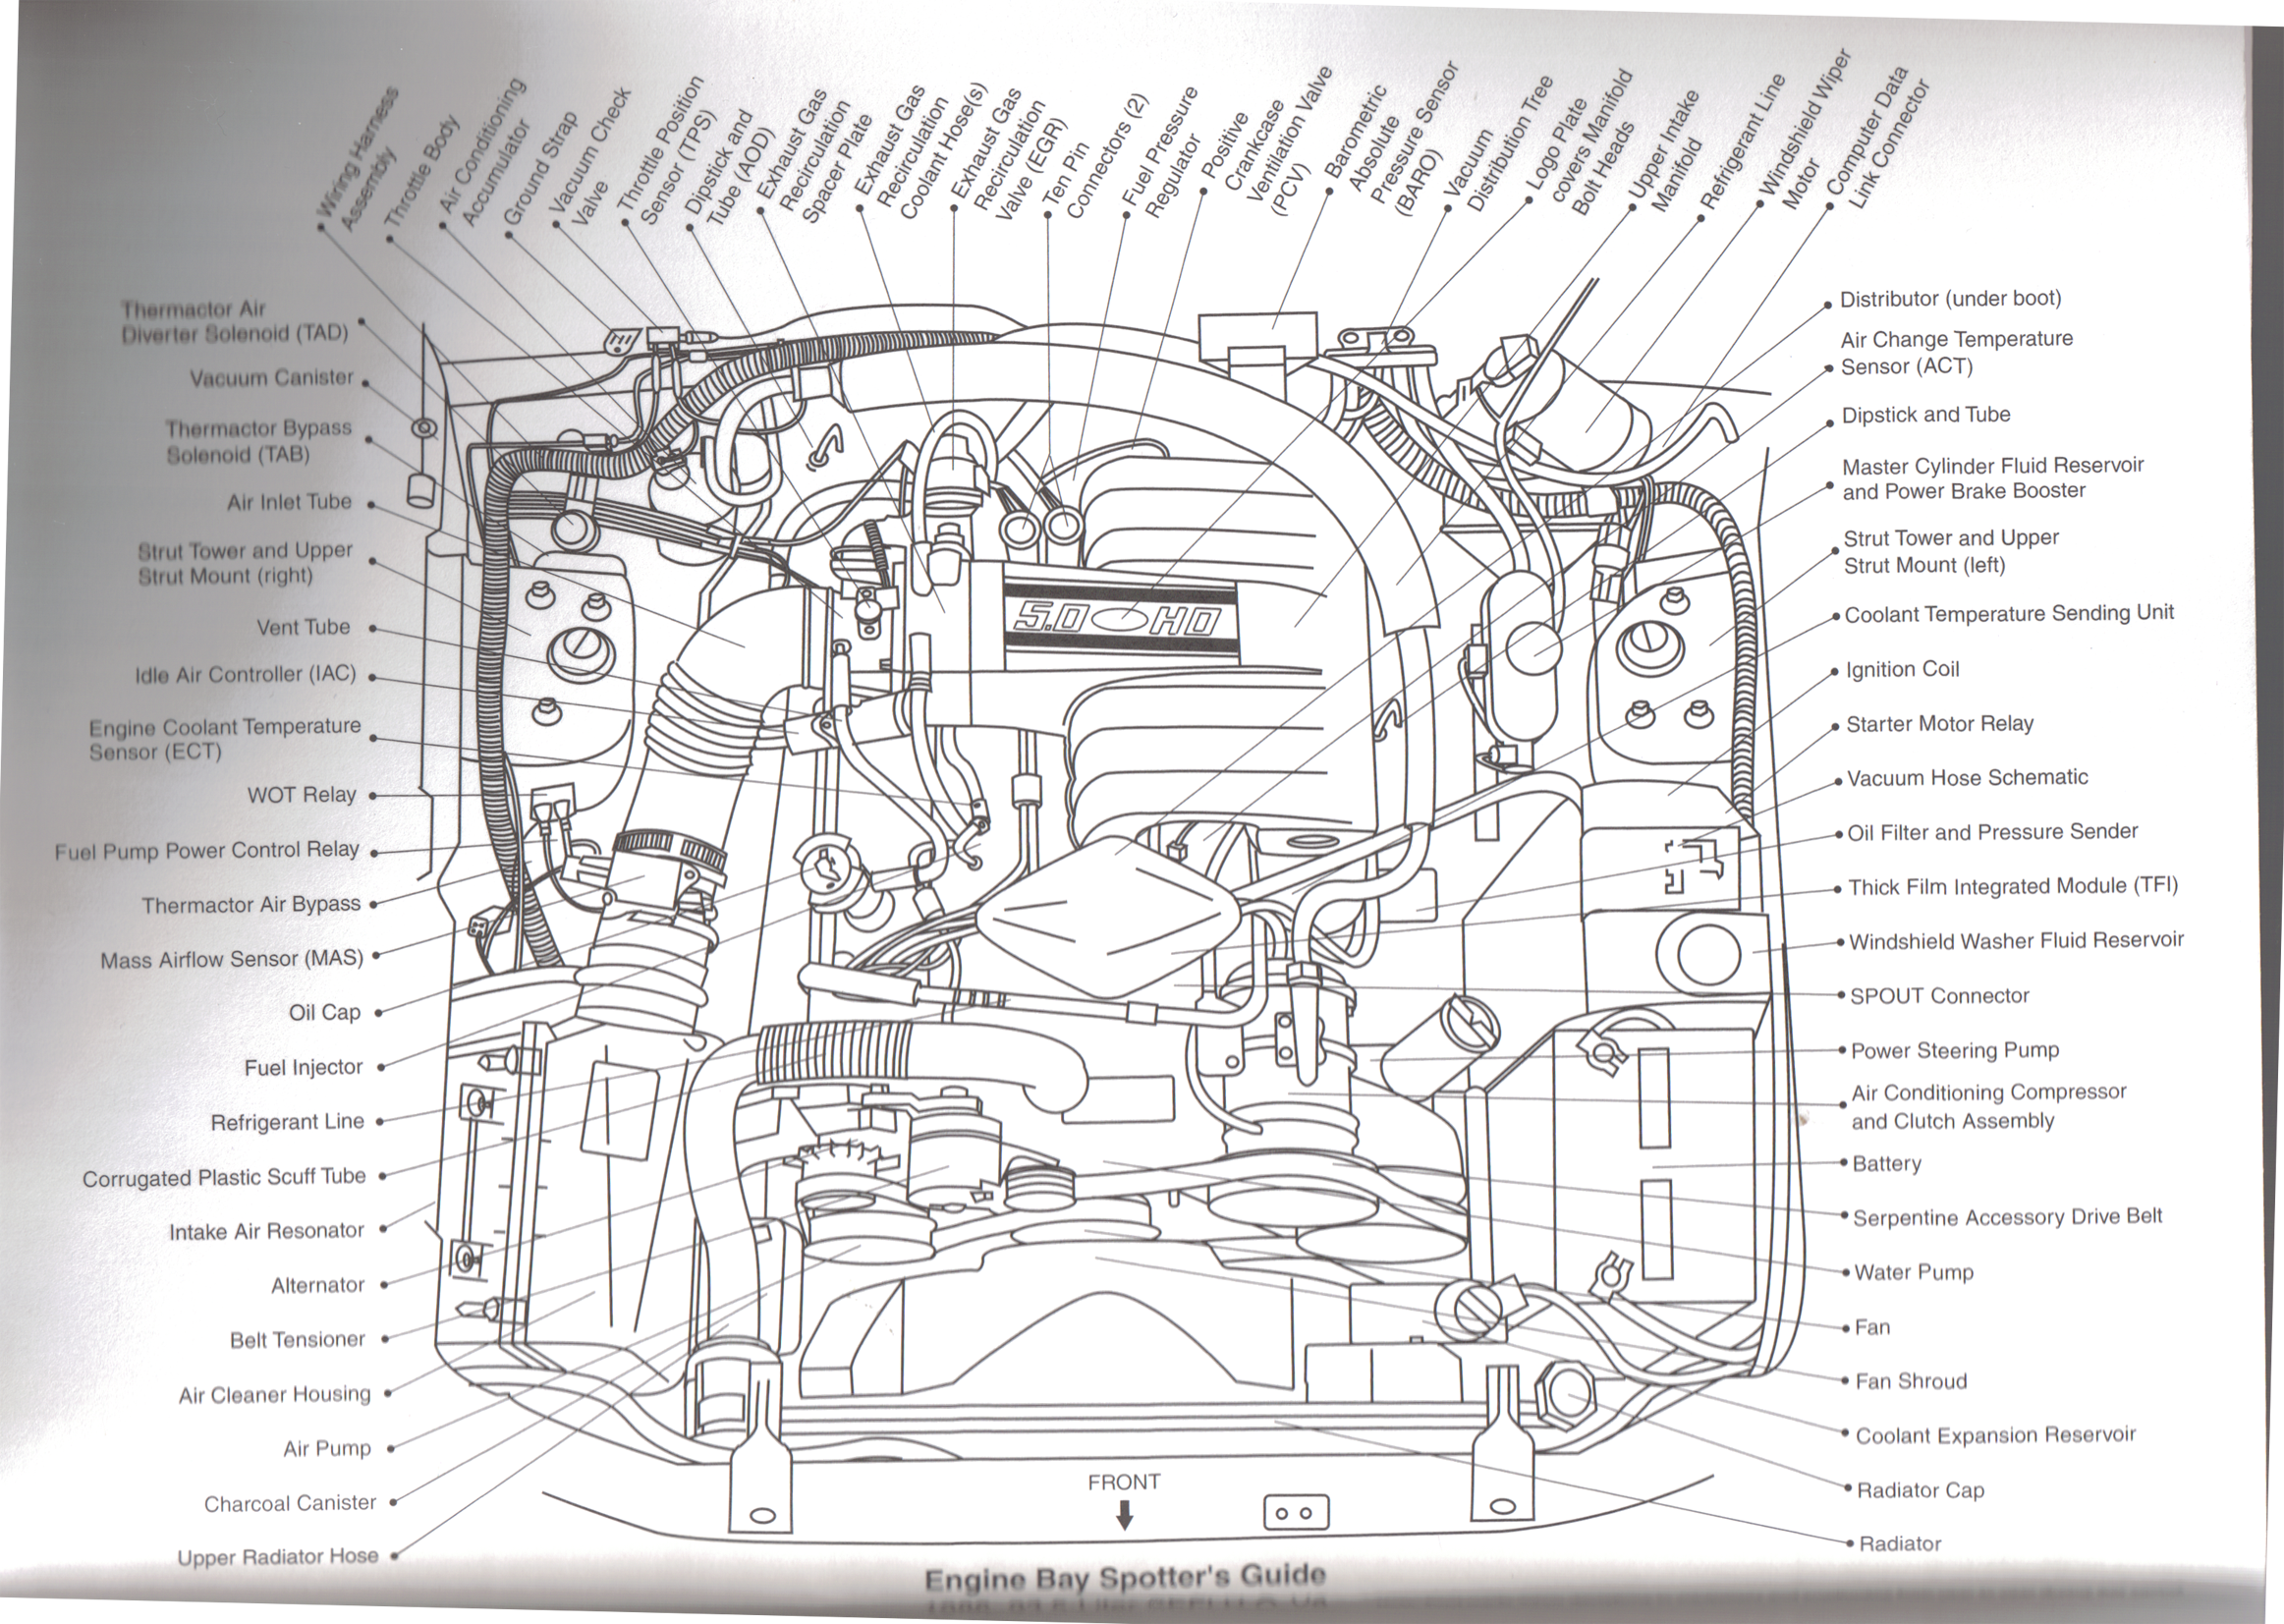 Surprising 1999 Ford E150 Fuse Box Wiring Library Wiring Cloud Hemtshollocom